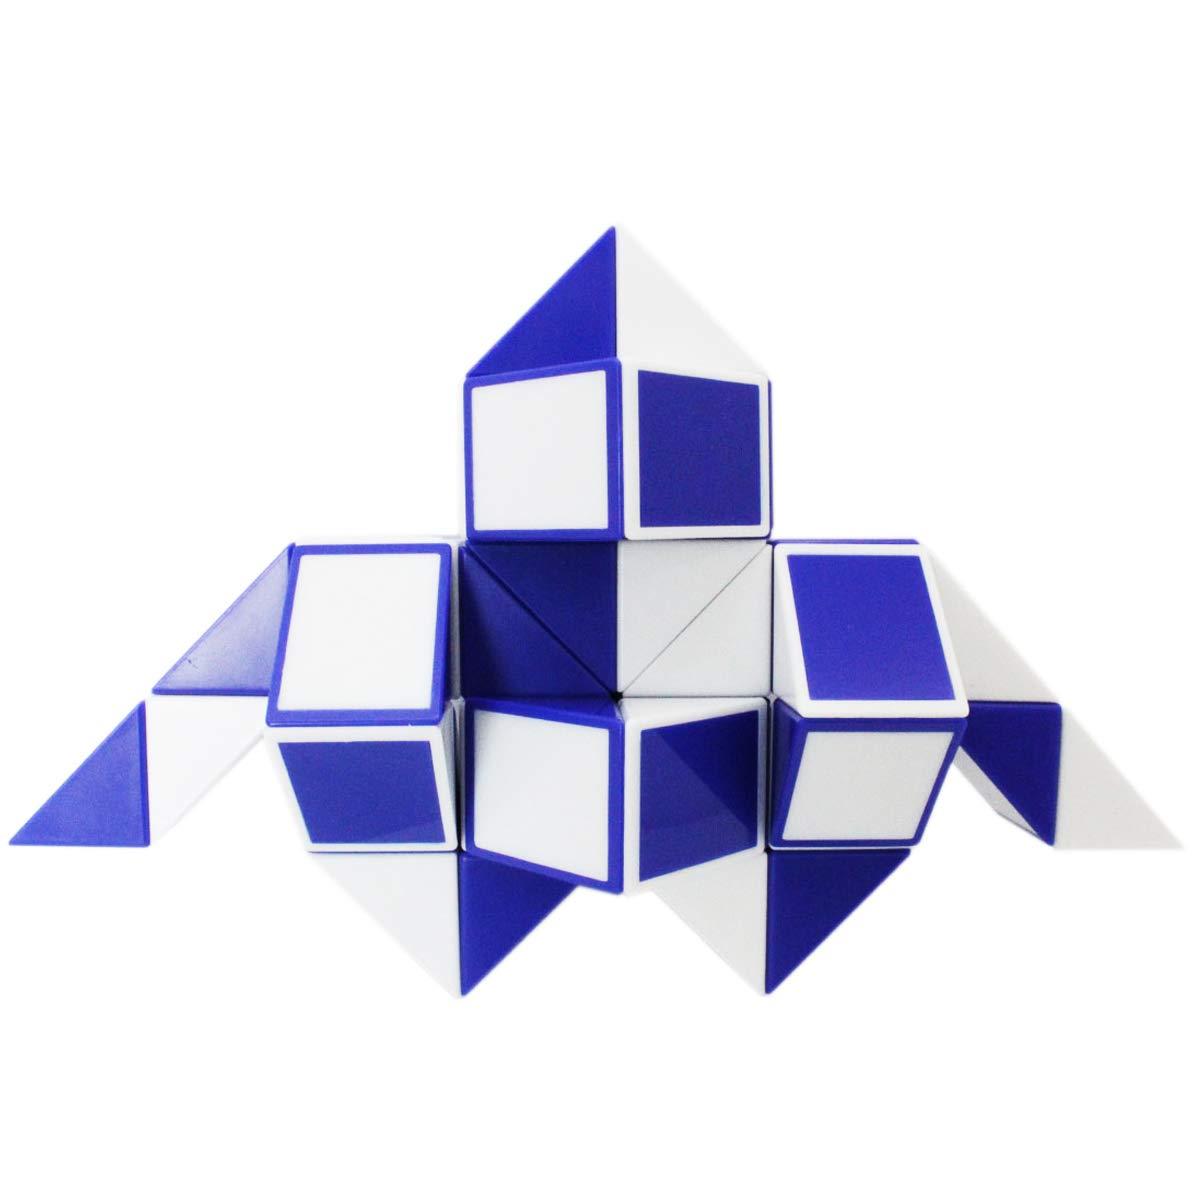 Mipartebo Magic Snake Cube Twist Puzzle 48 Wedges Brain Teaser Fidget Sensory Toys Big Size Party Favors for Kids Blue